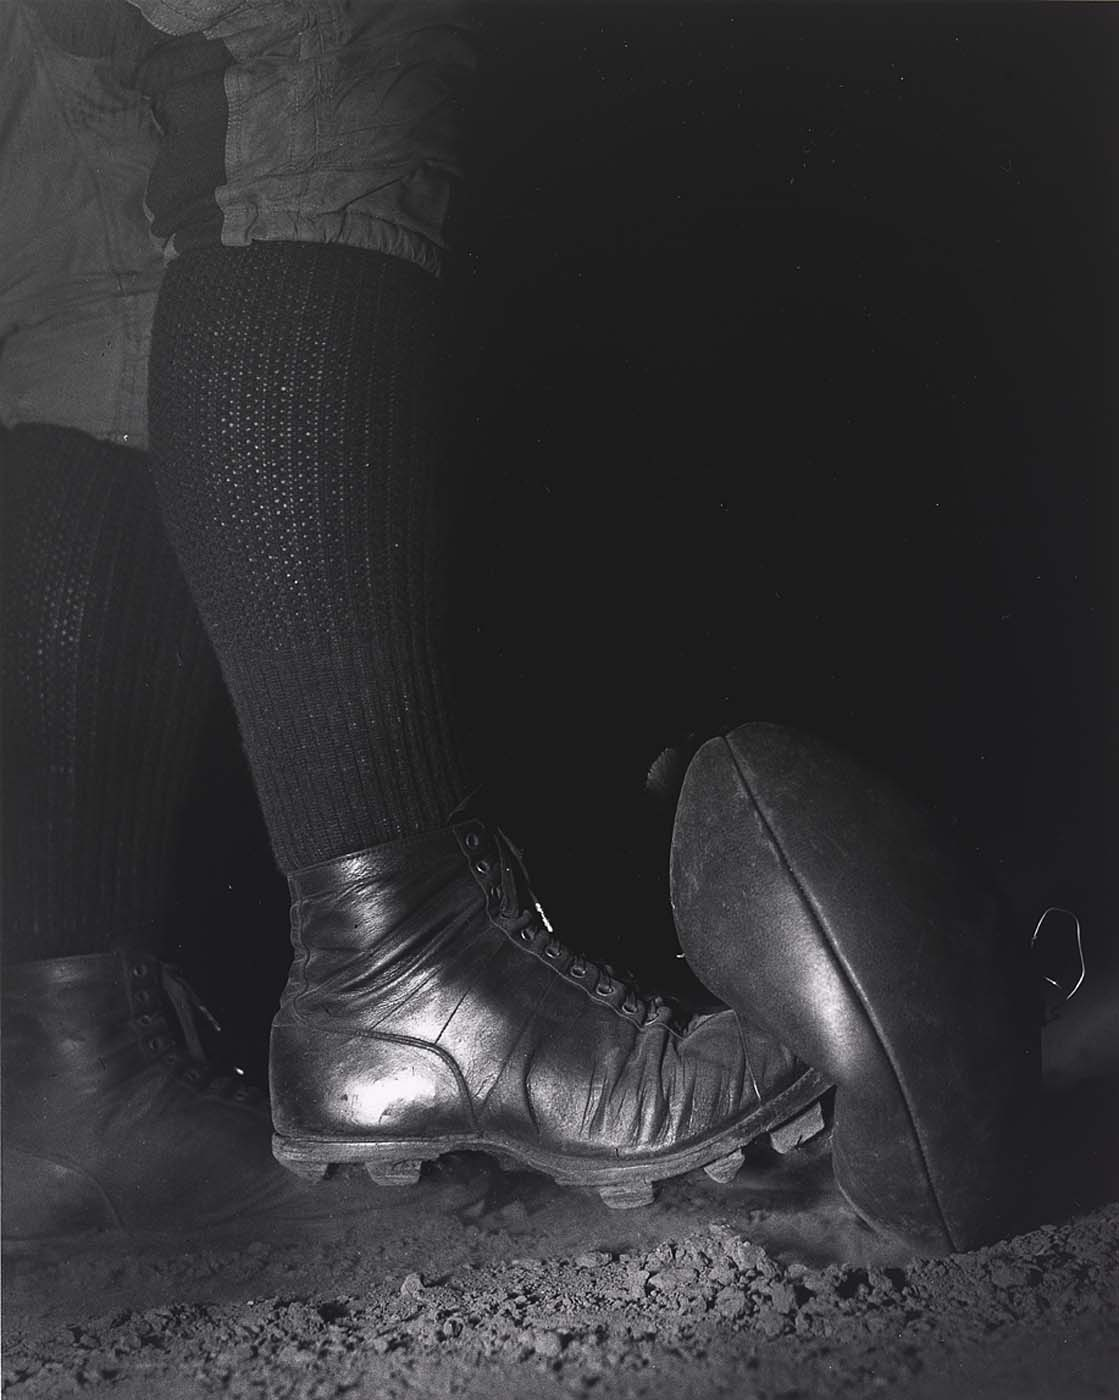 Wesely Fesler kicking a football, Boston, 1934 by Harold E. Edgerton .jpeg